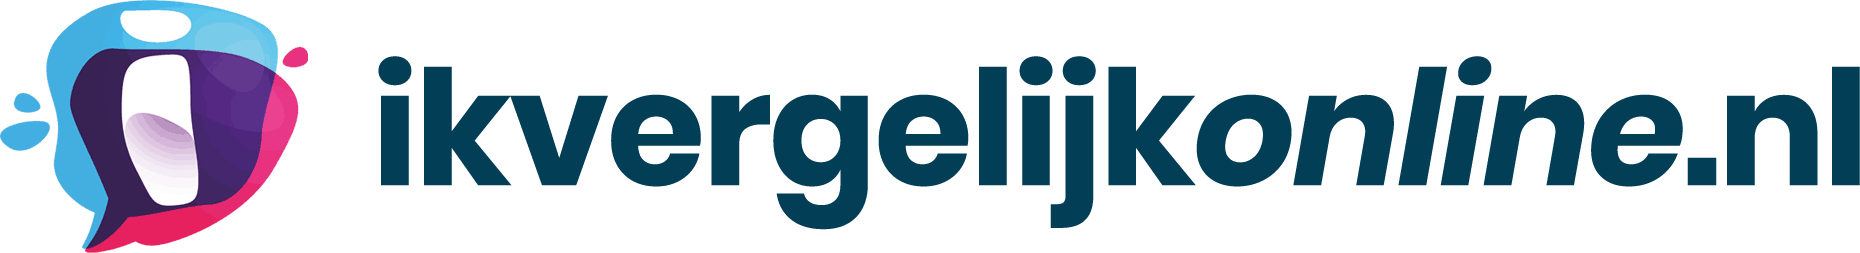 Ikvergelijkonline.nl Logo